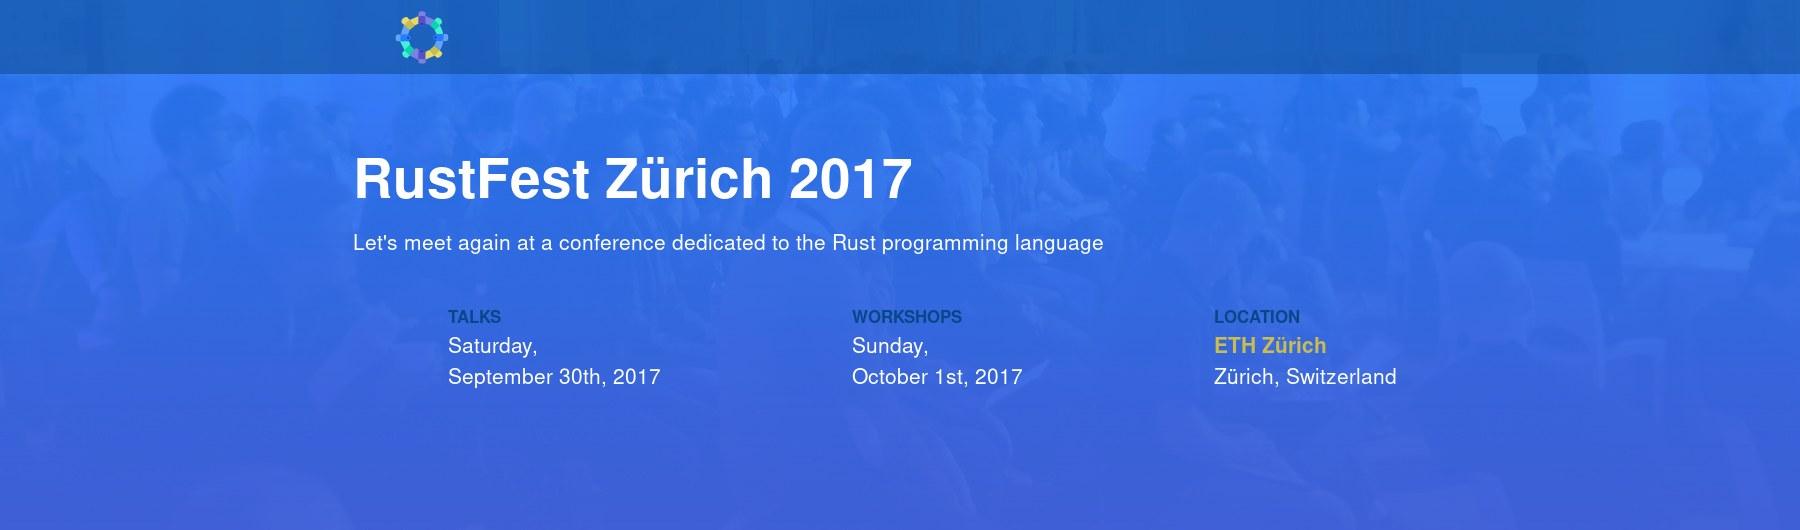 RustFest Zürich